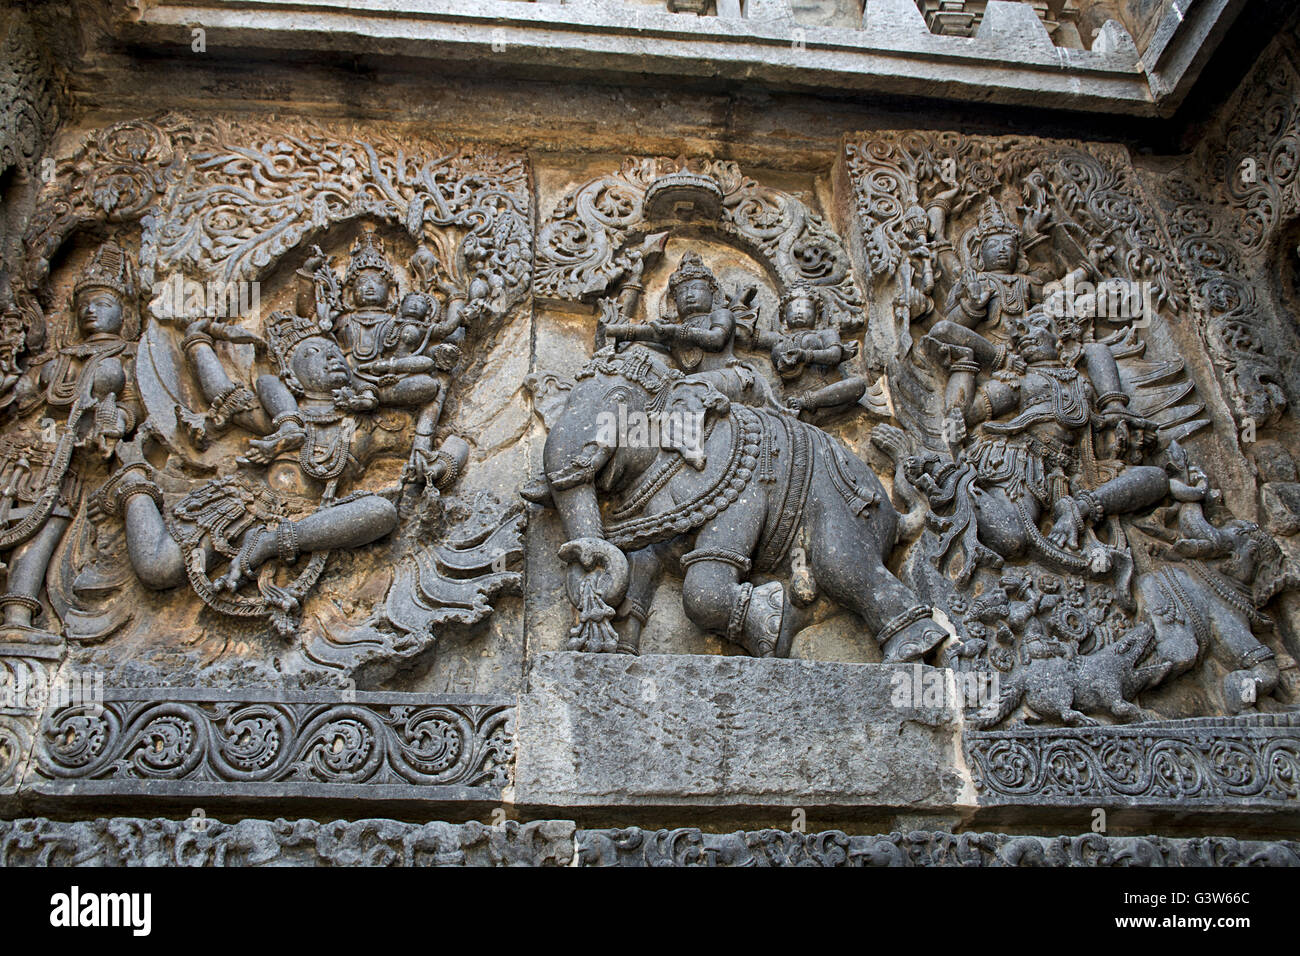 Lord Garuda Stock Photos & Lord Garuda Stock Images - Alamy